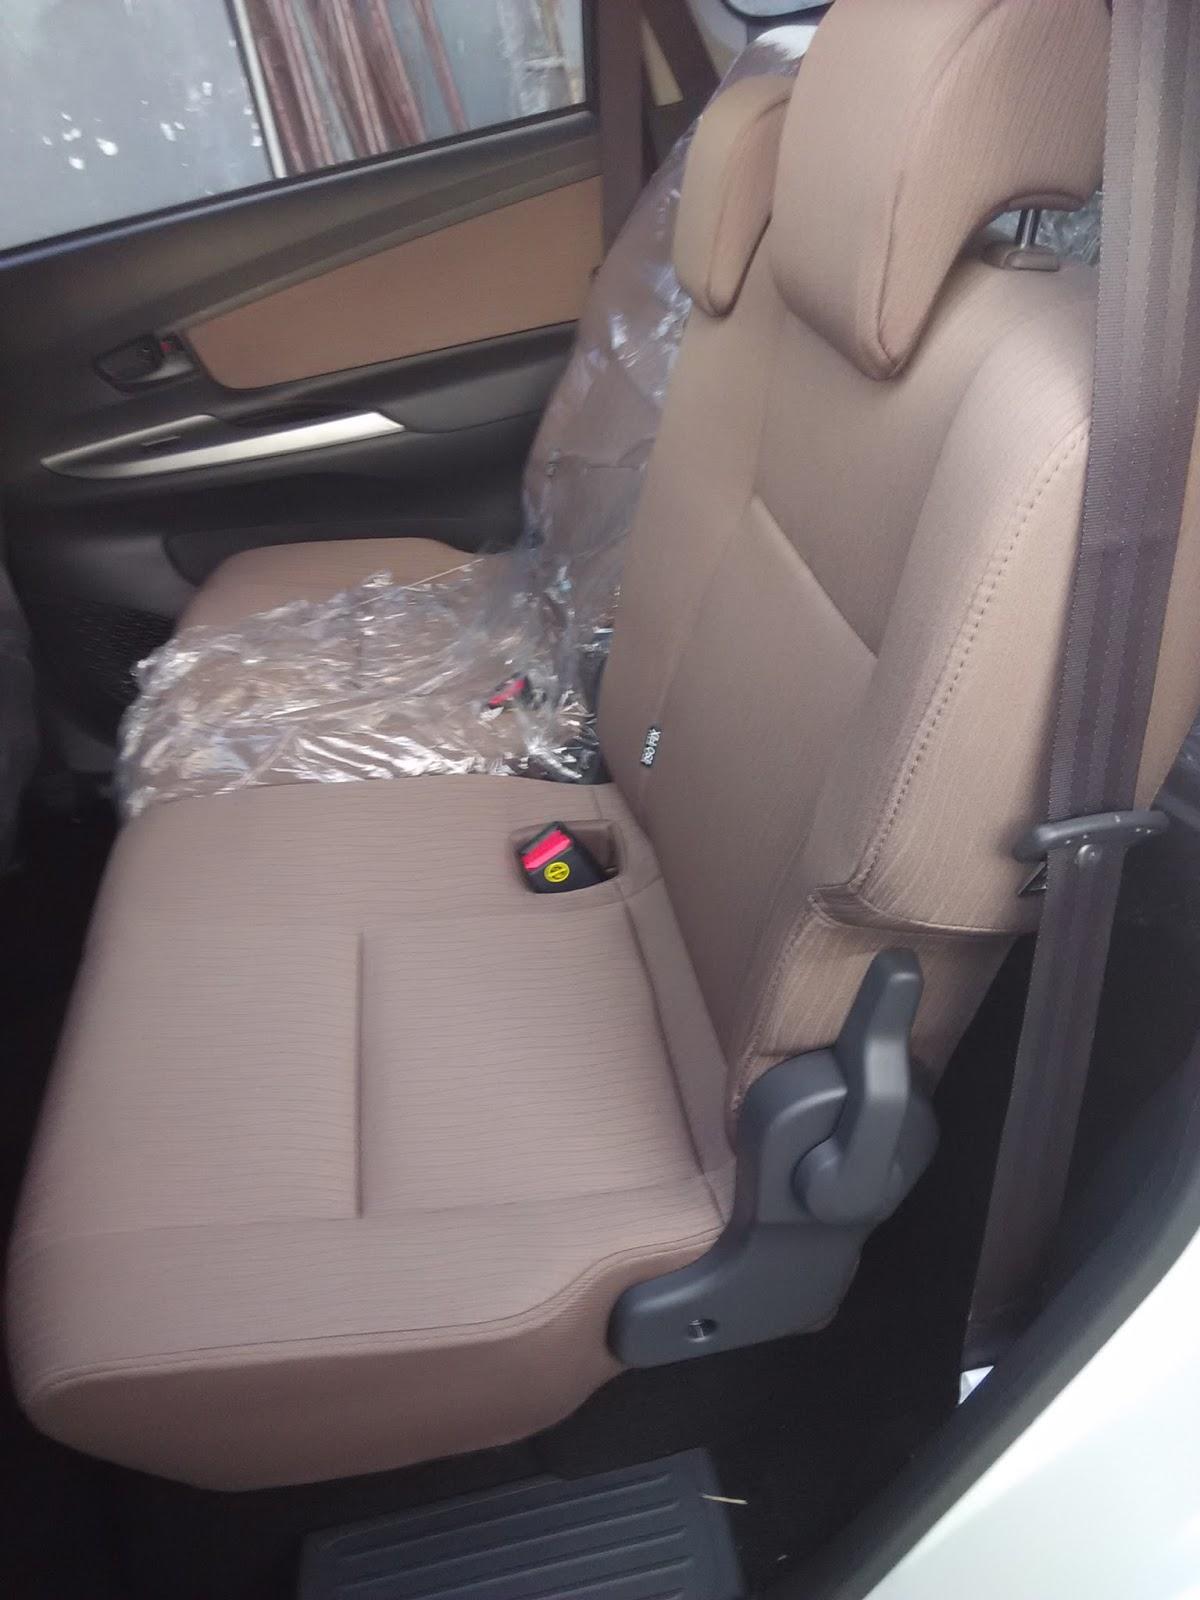 Jok Grand New Avanza Oli All Kijang Innova Lebih Dekat Dengan G 1 3 Dikta Toyota Informasi Baris Ke 2 Tambahan Center Head Rest